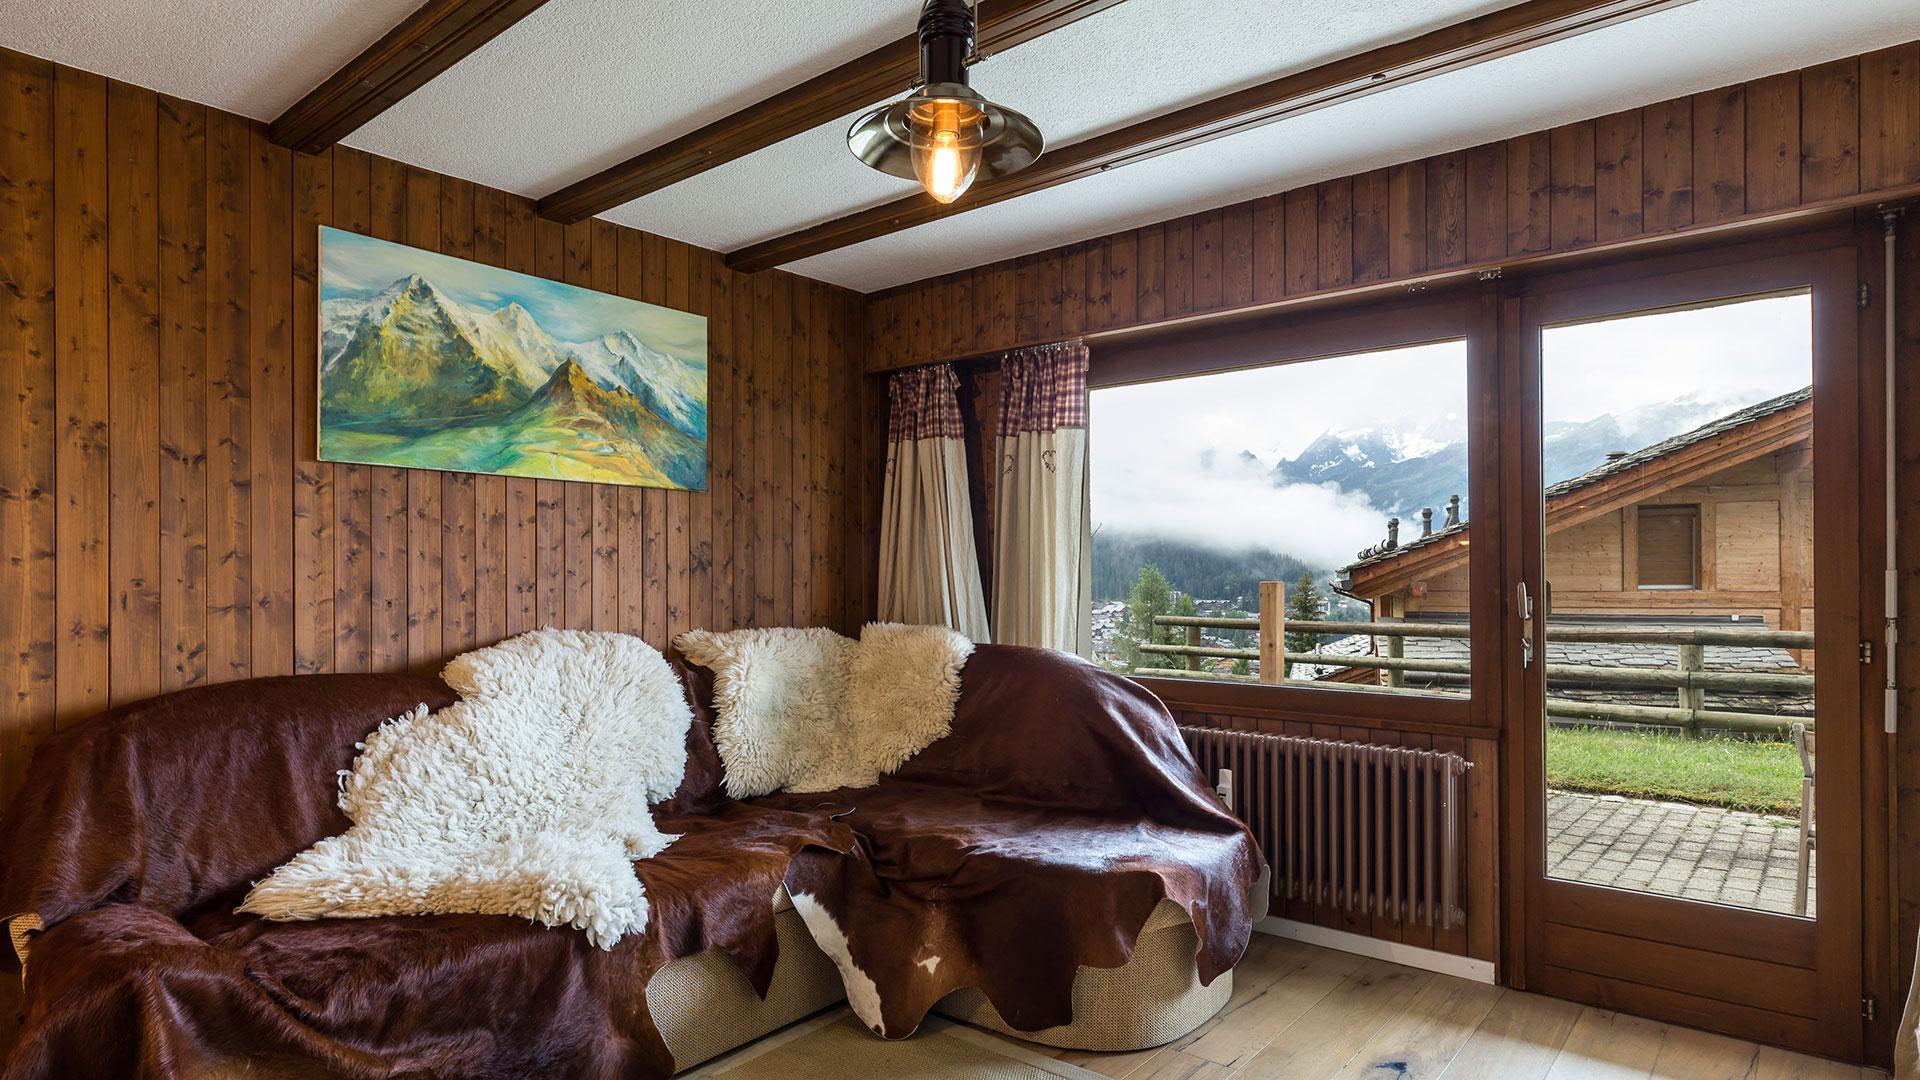 Athos 9 Apartments, Switzerland